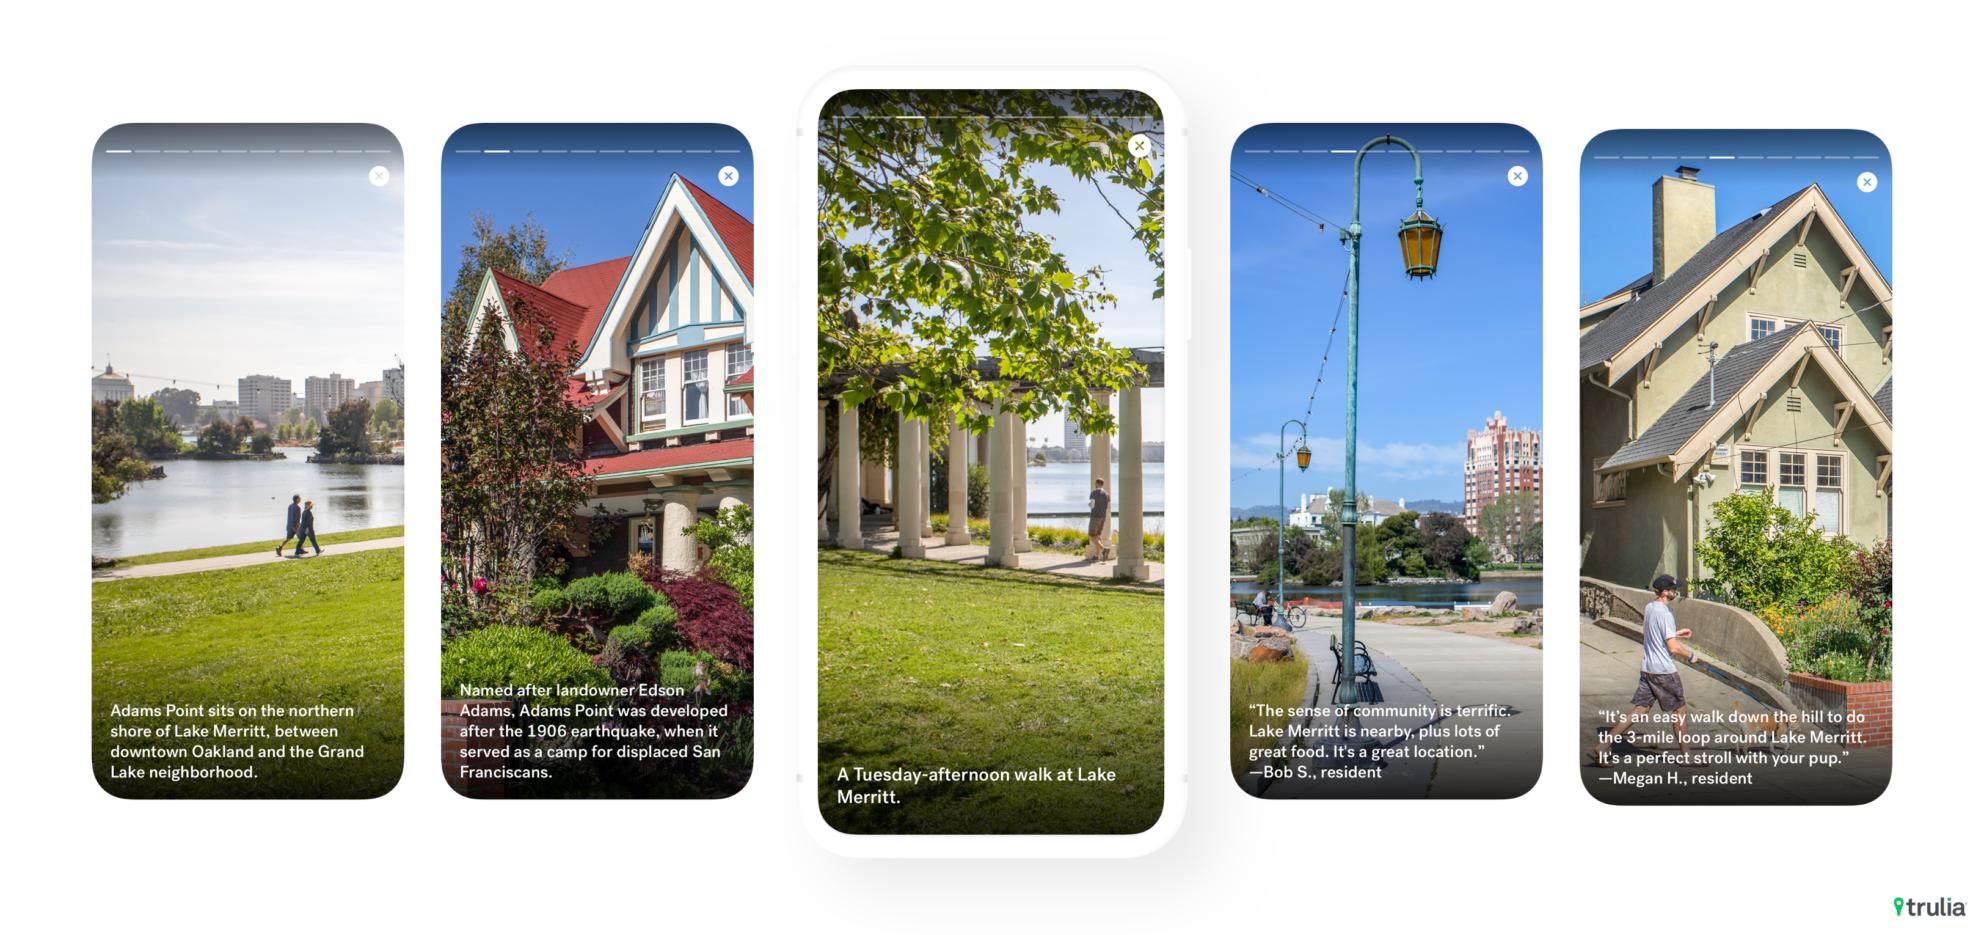 Trulia Neighborhoods Launches To Make Communities Look LIke